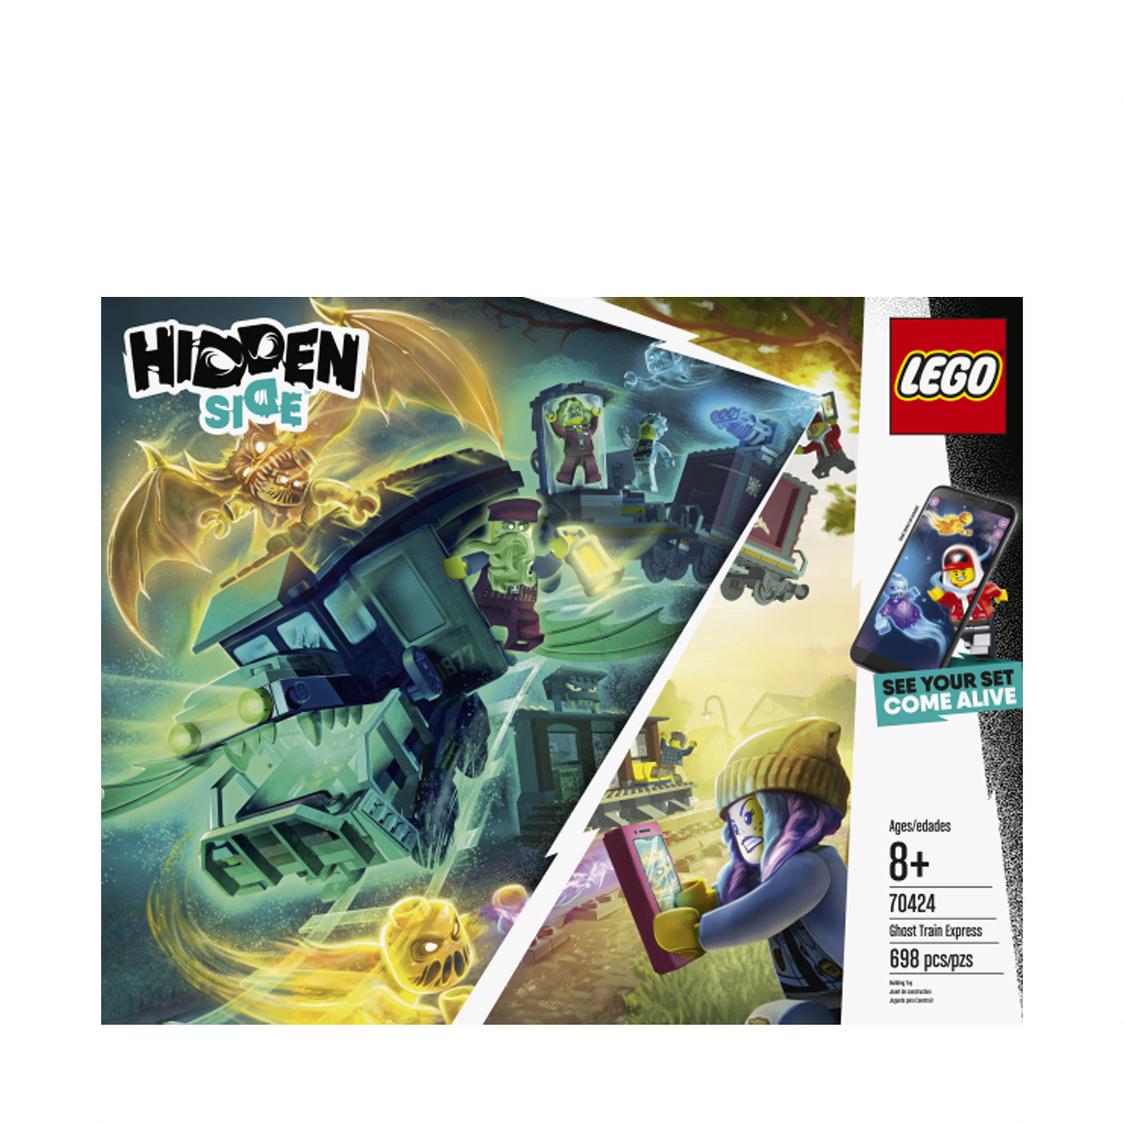 LEGO HIDDEN SIDE - Ghost Train Express 70424